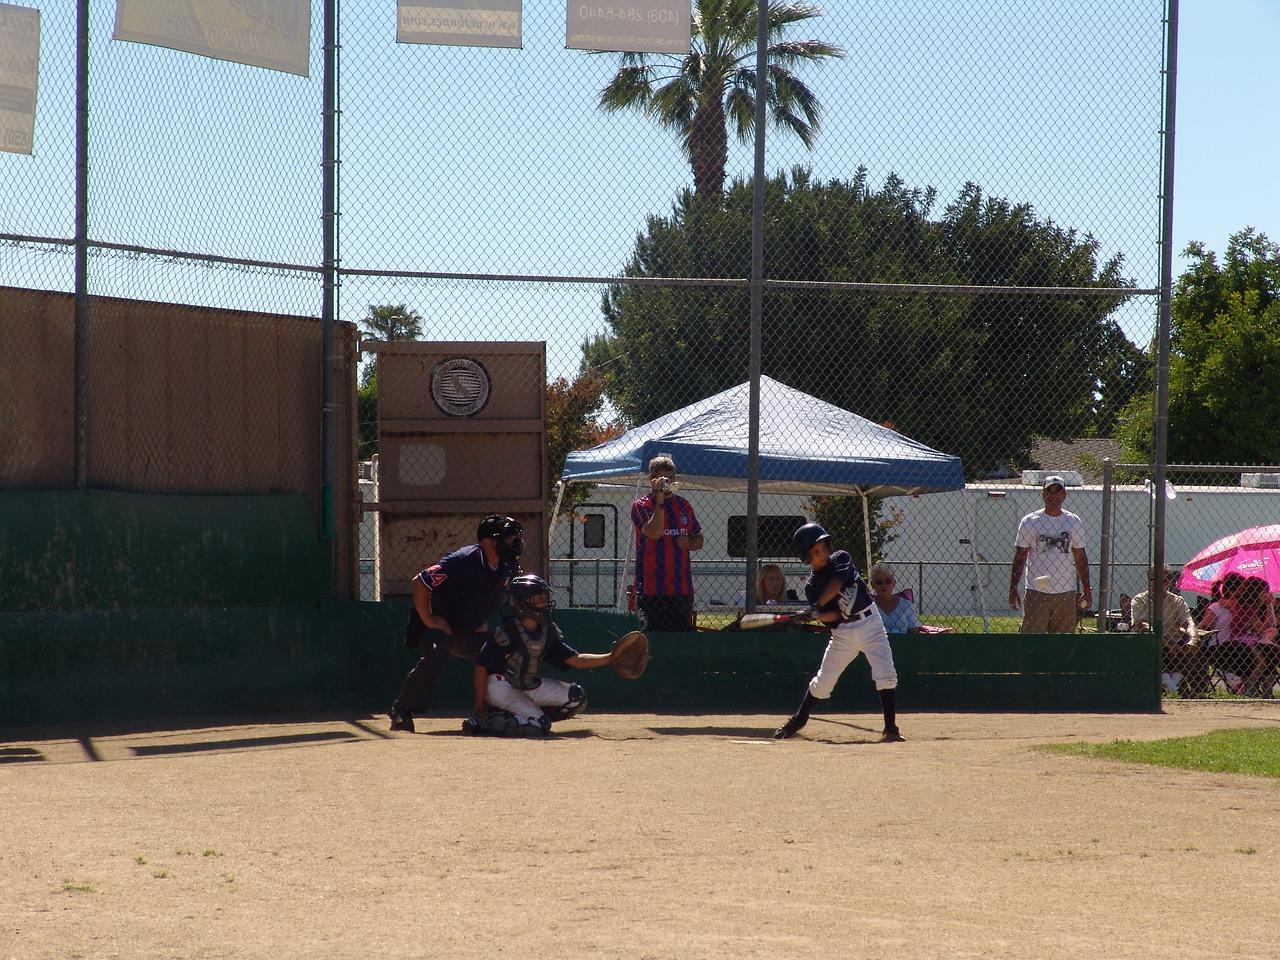 Yankees vs Twins TrnRnd2 (44)